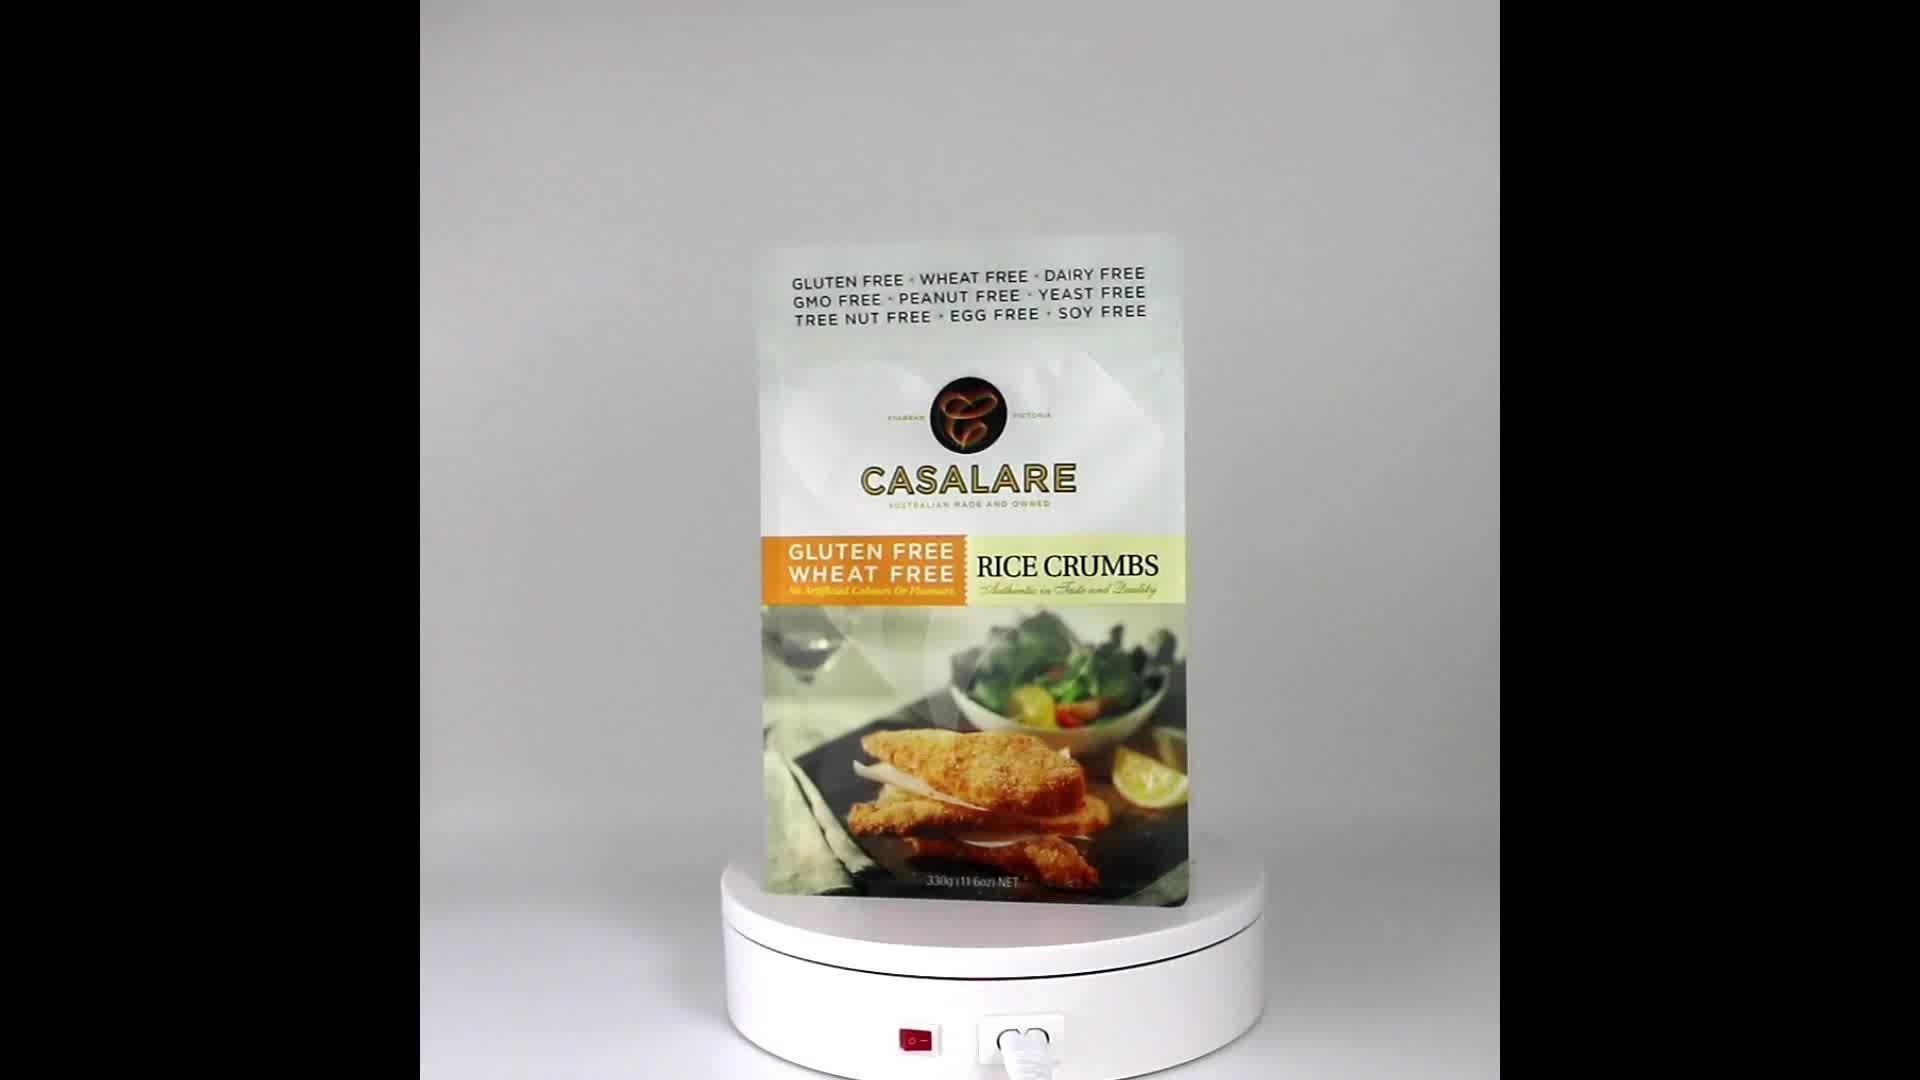 China Food-grade eight-side gusset ziplock bag for Gluten-free rice crumbs